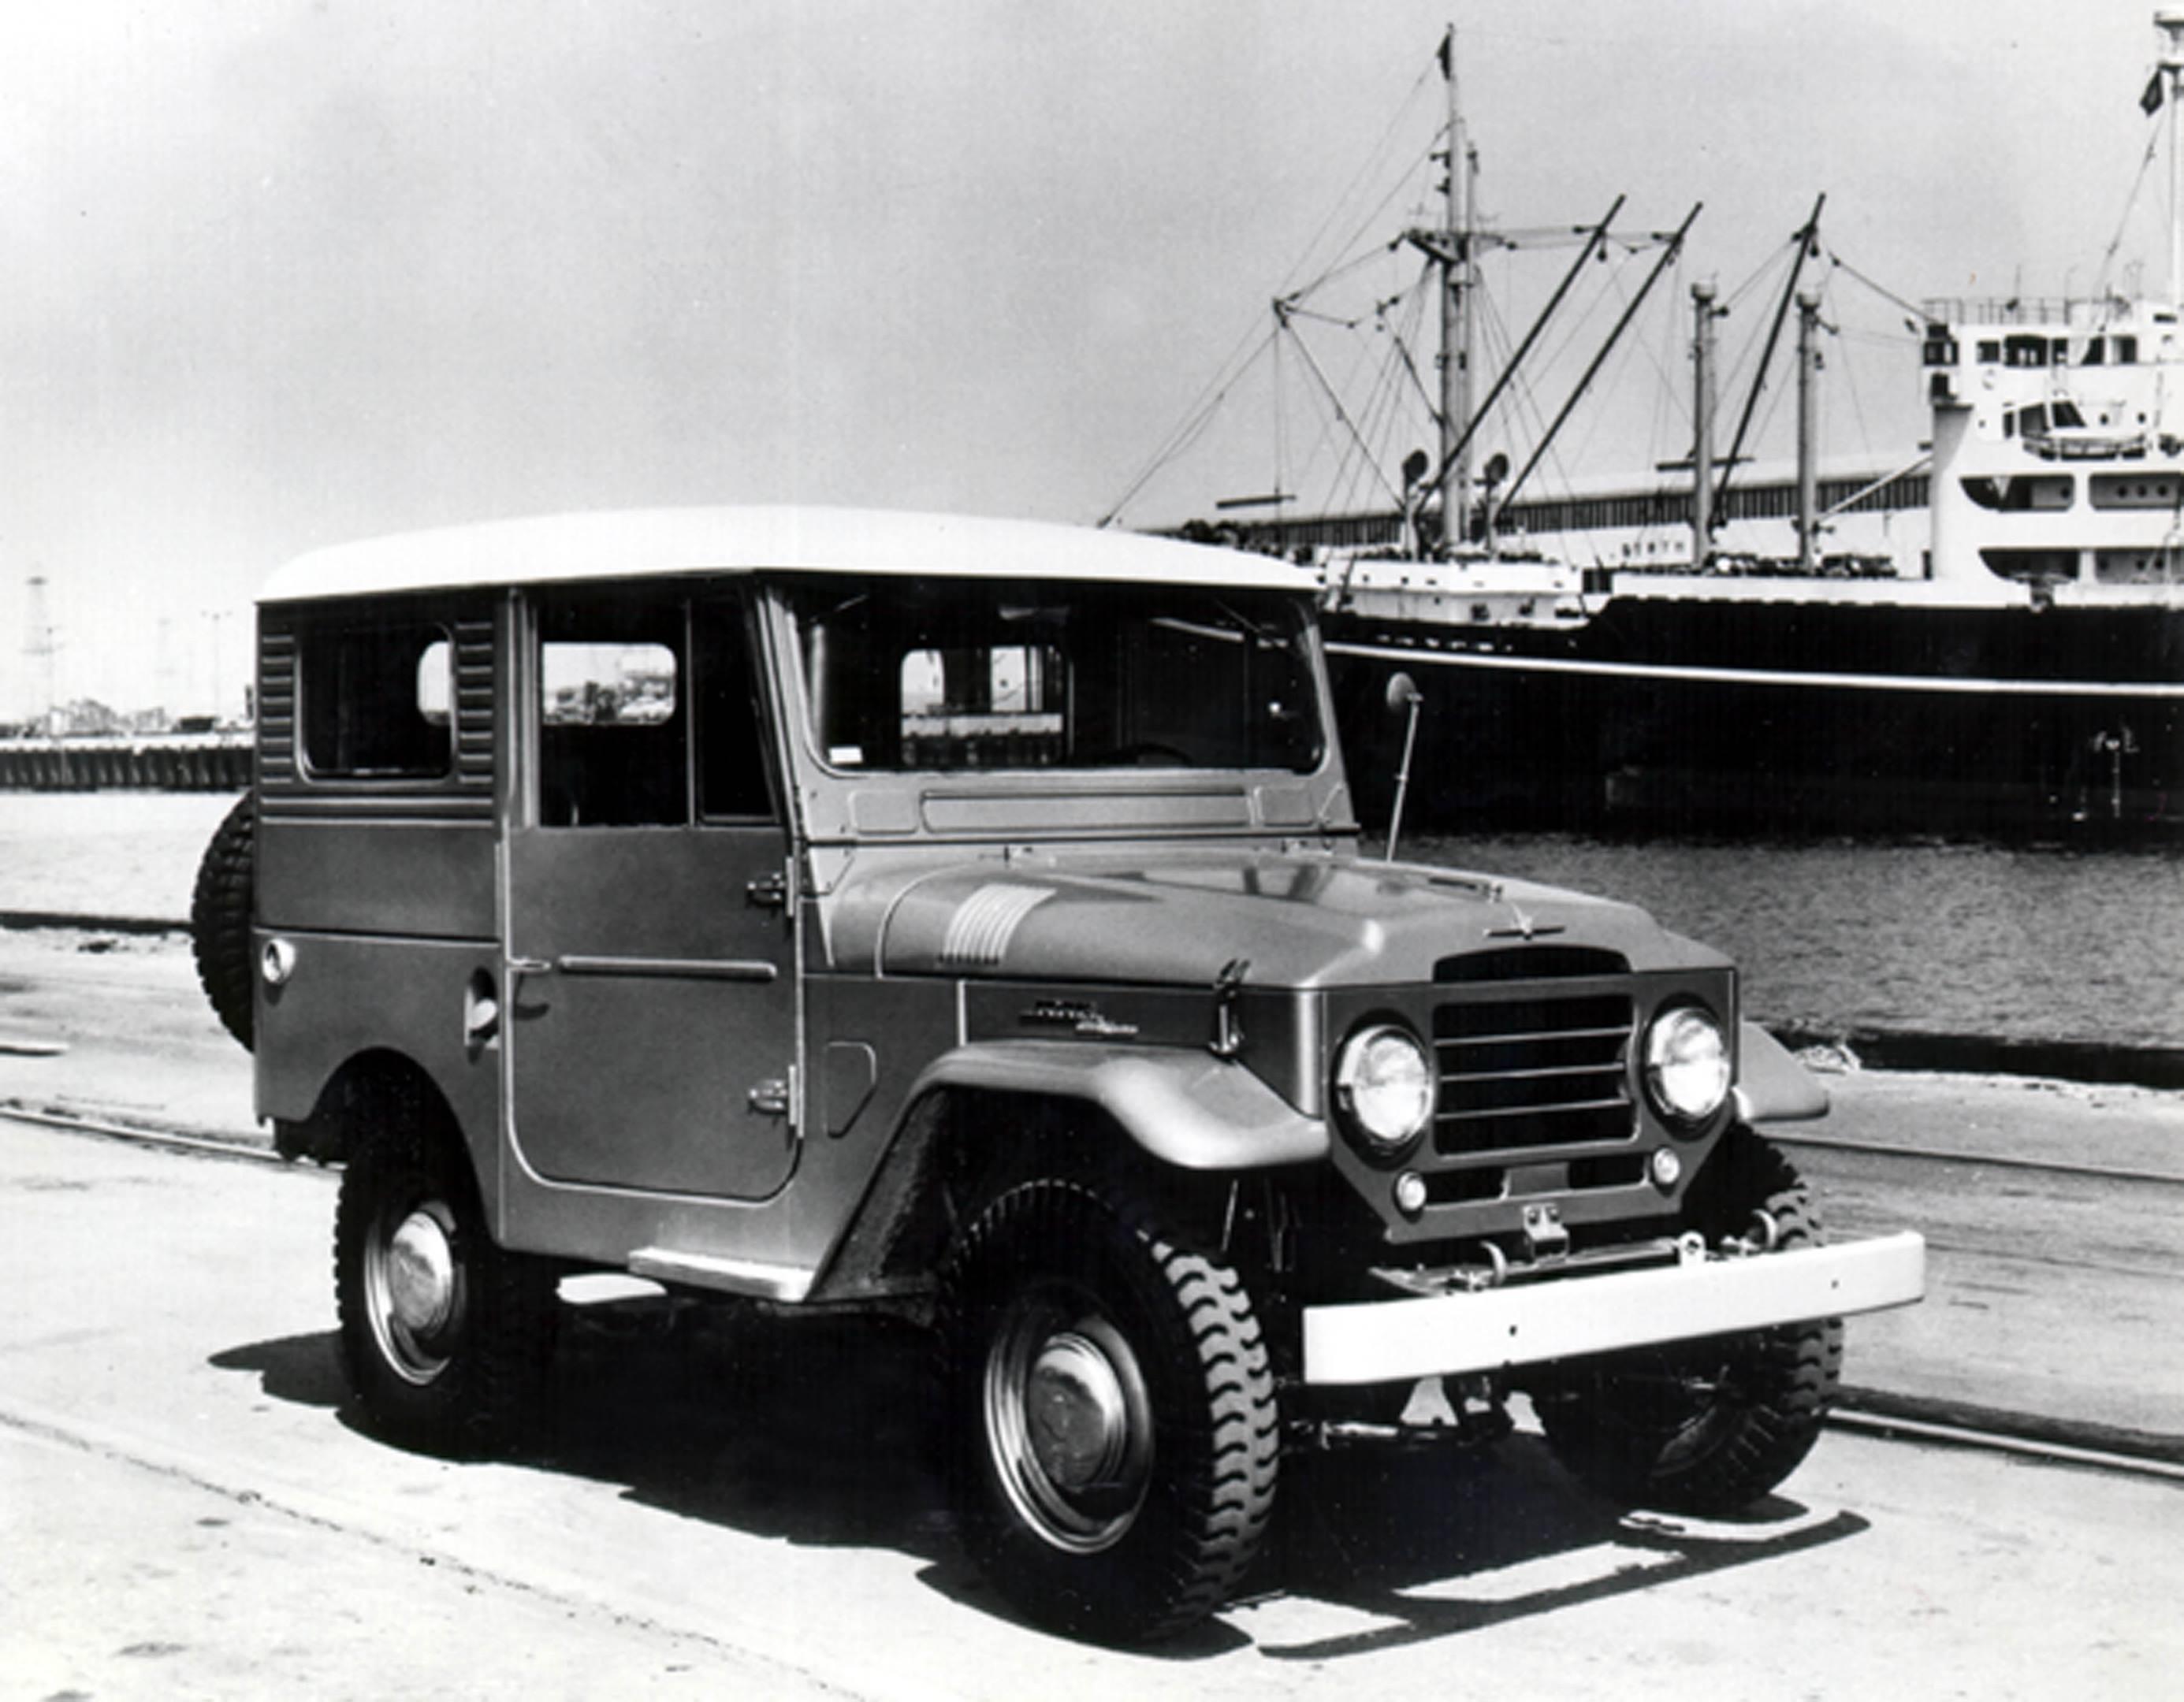 1960 Toyota FJ40 Land Cruiser